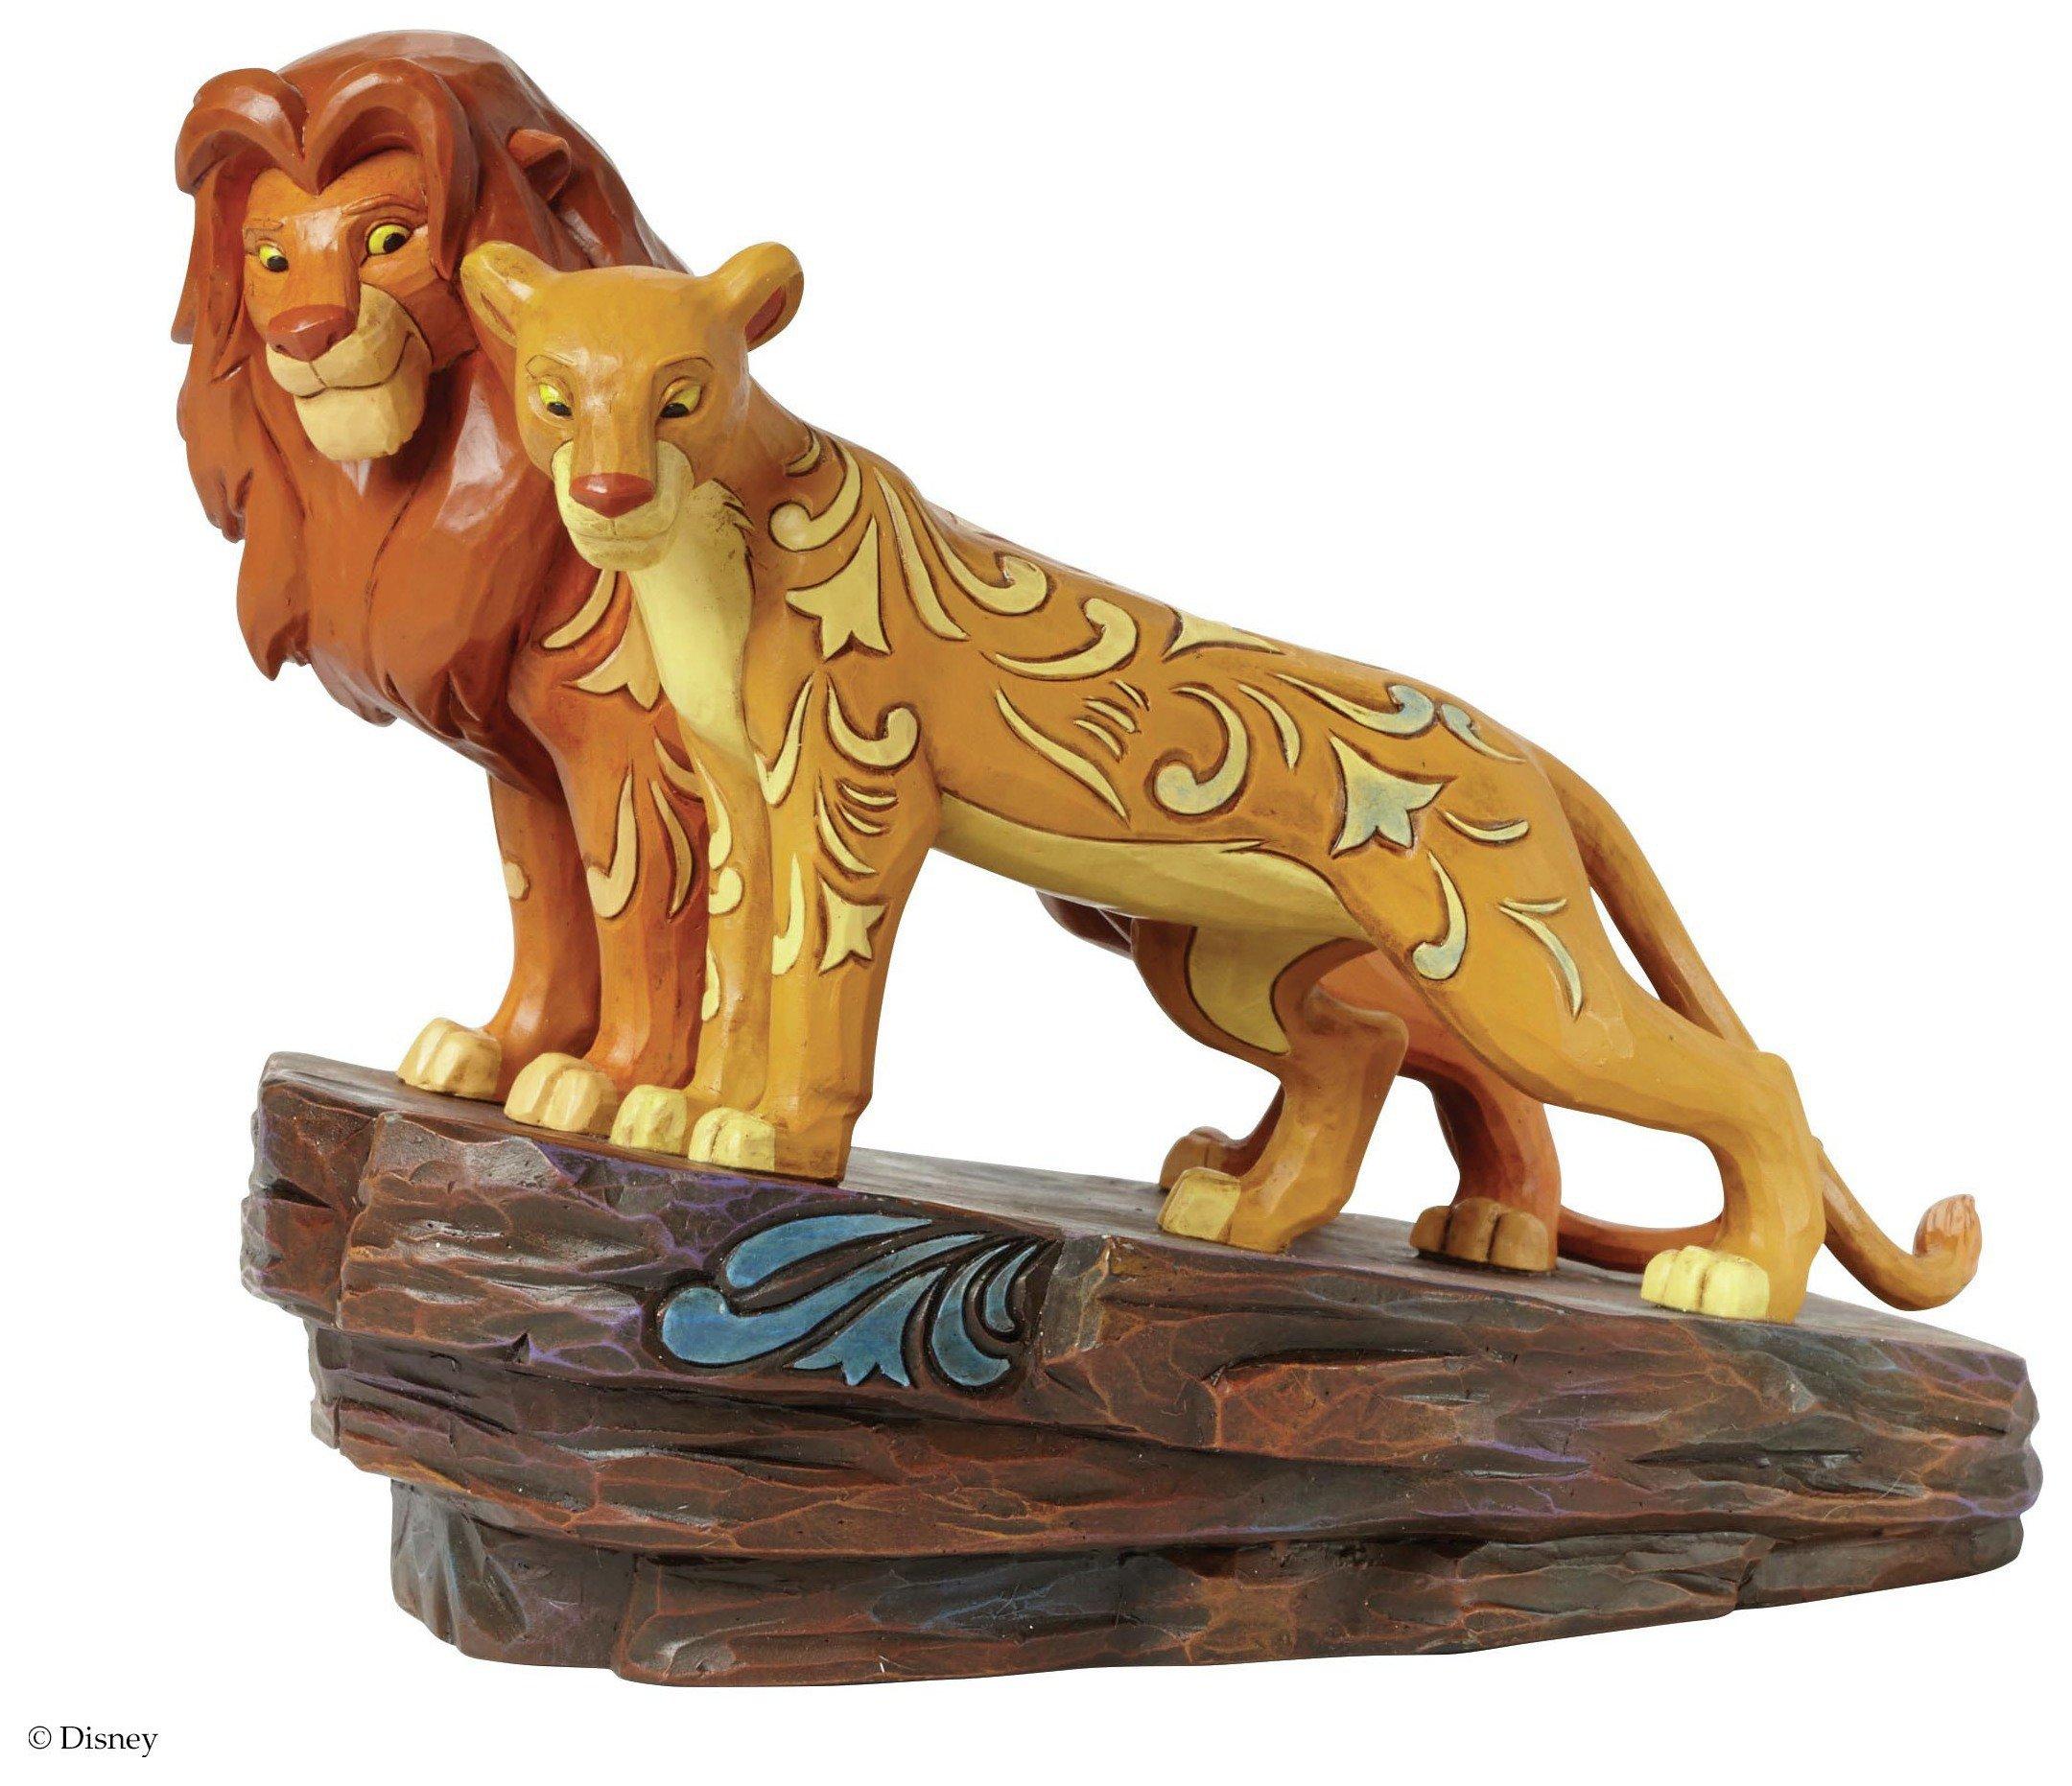 Disney - Traditions - Love at Pride Rock Simba and Nala - Figurine lowest price